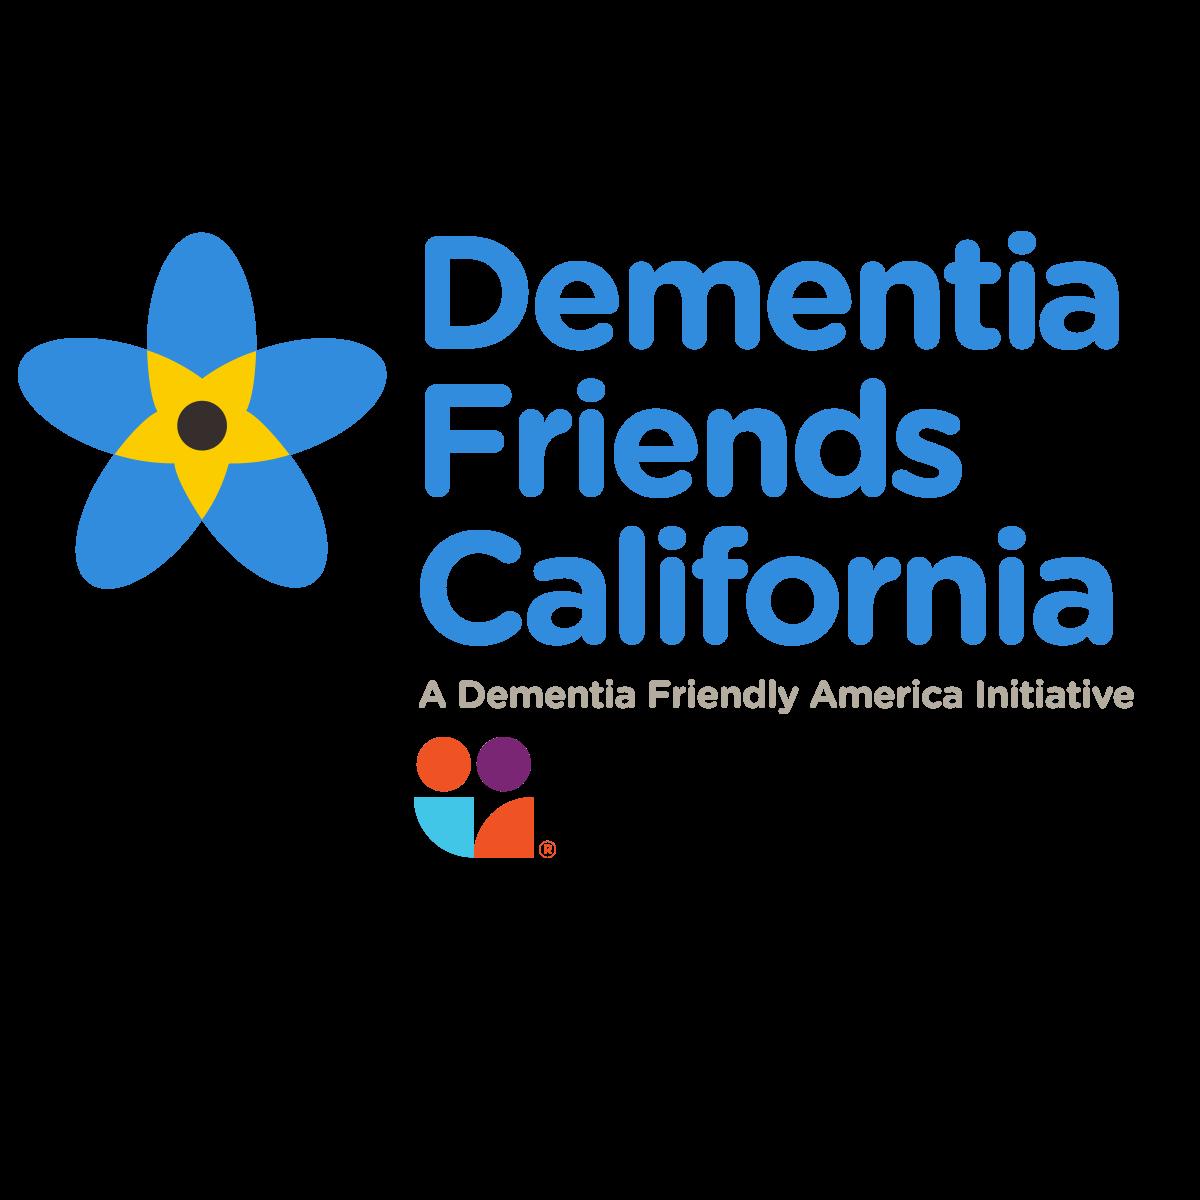 Dementia Friends California logo